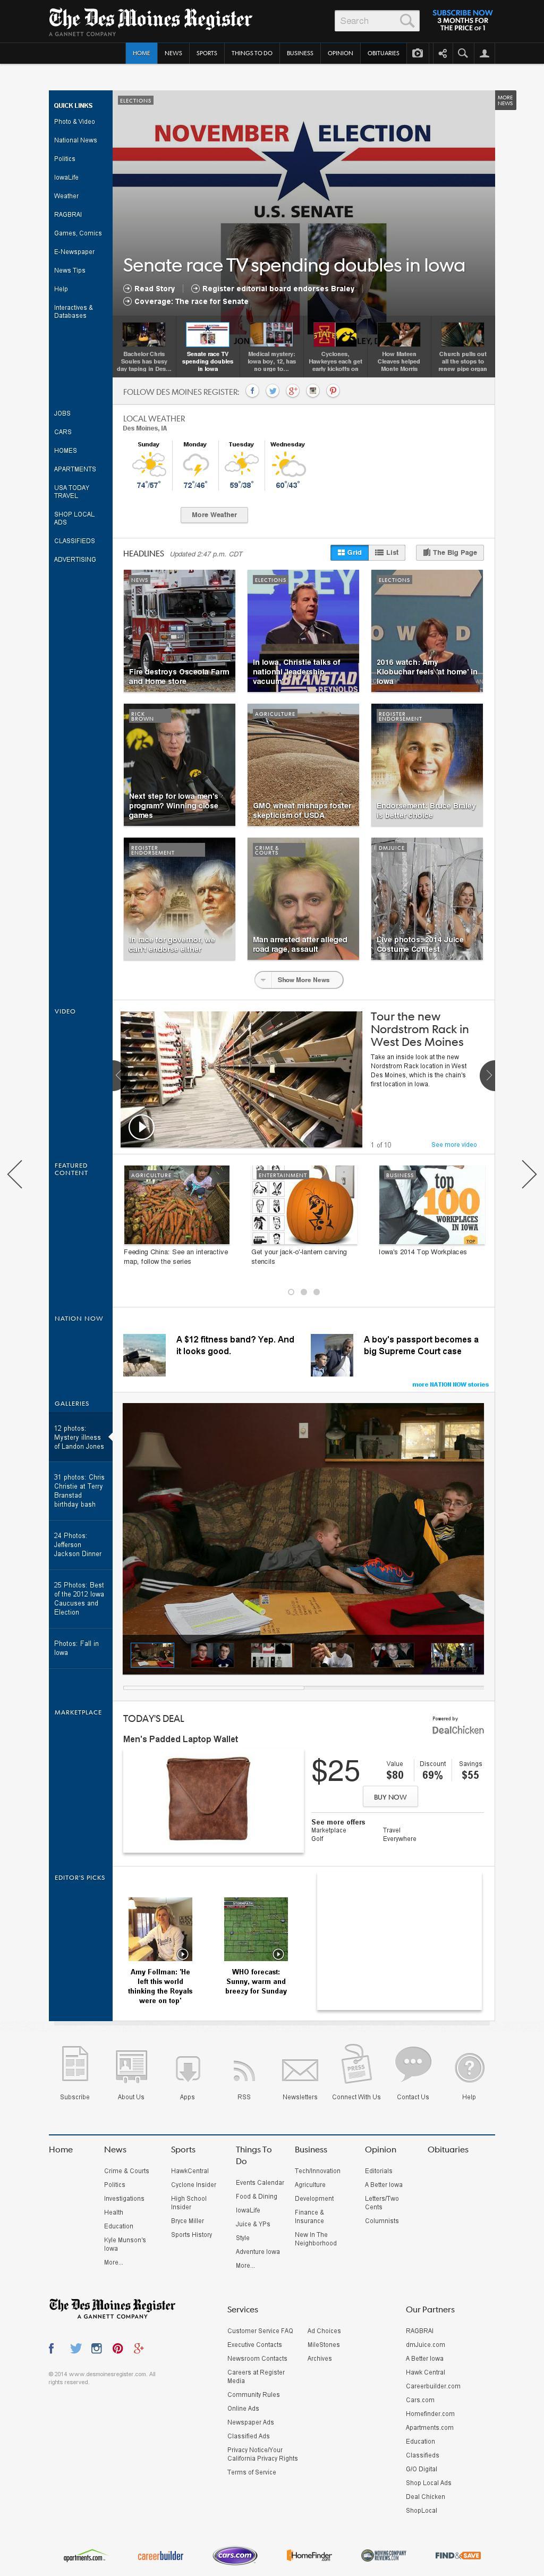 DesMoinesRegister.com at Sunday Oct. 26, 2014, 8:03 p.m. UTC